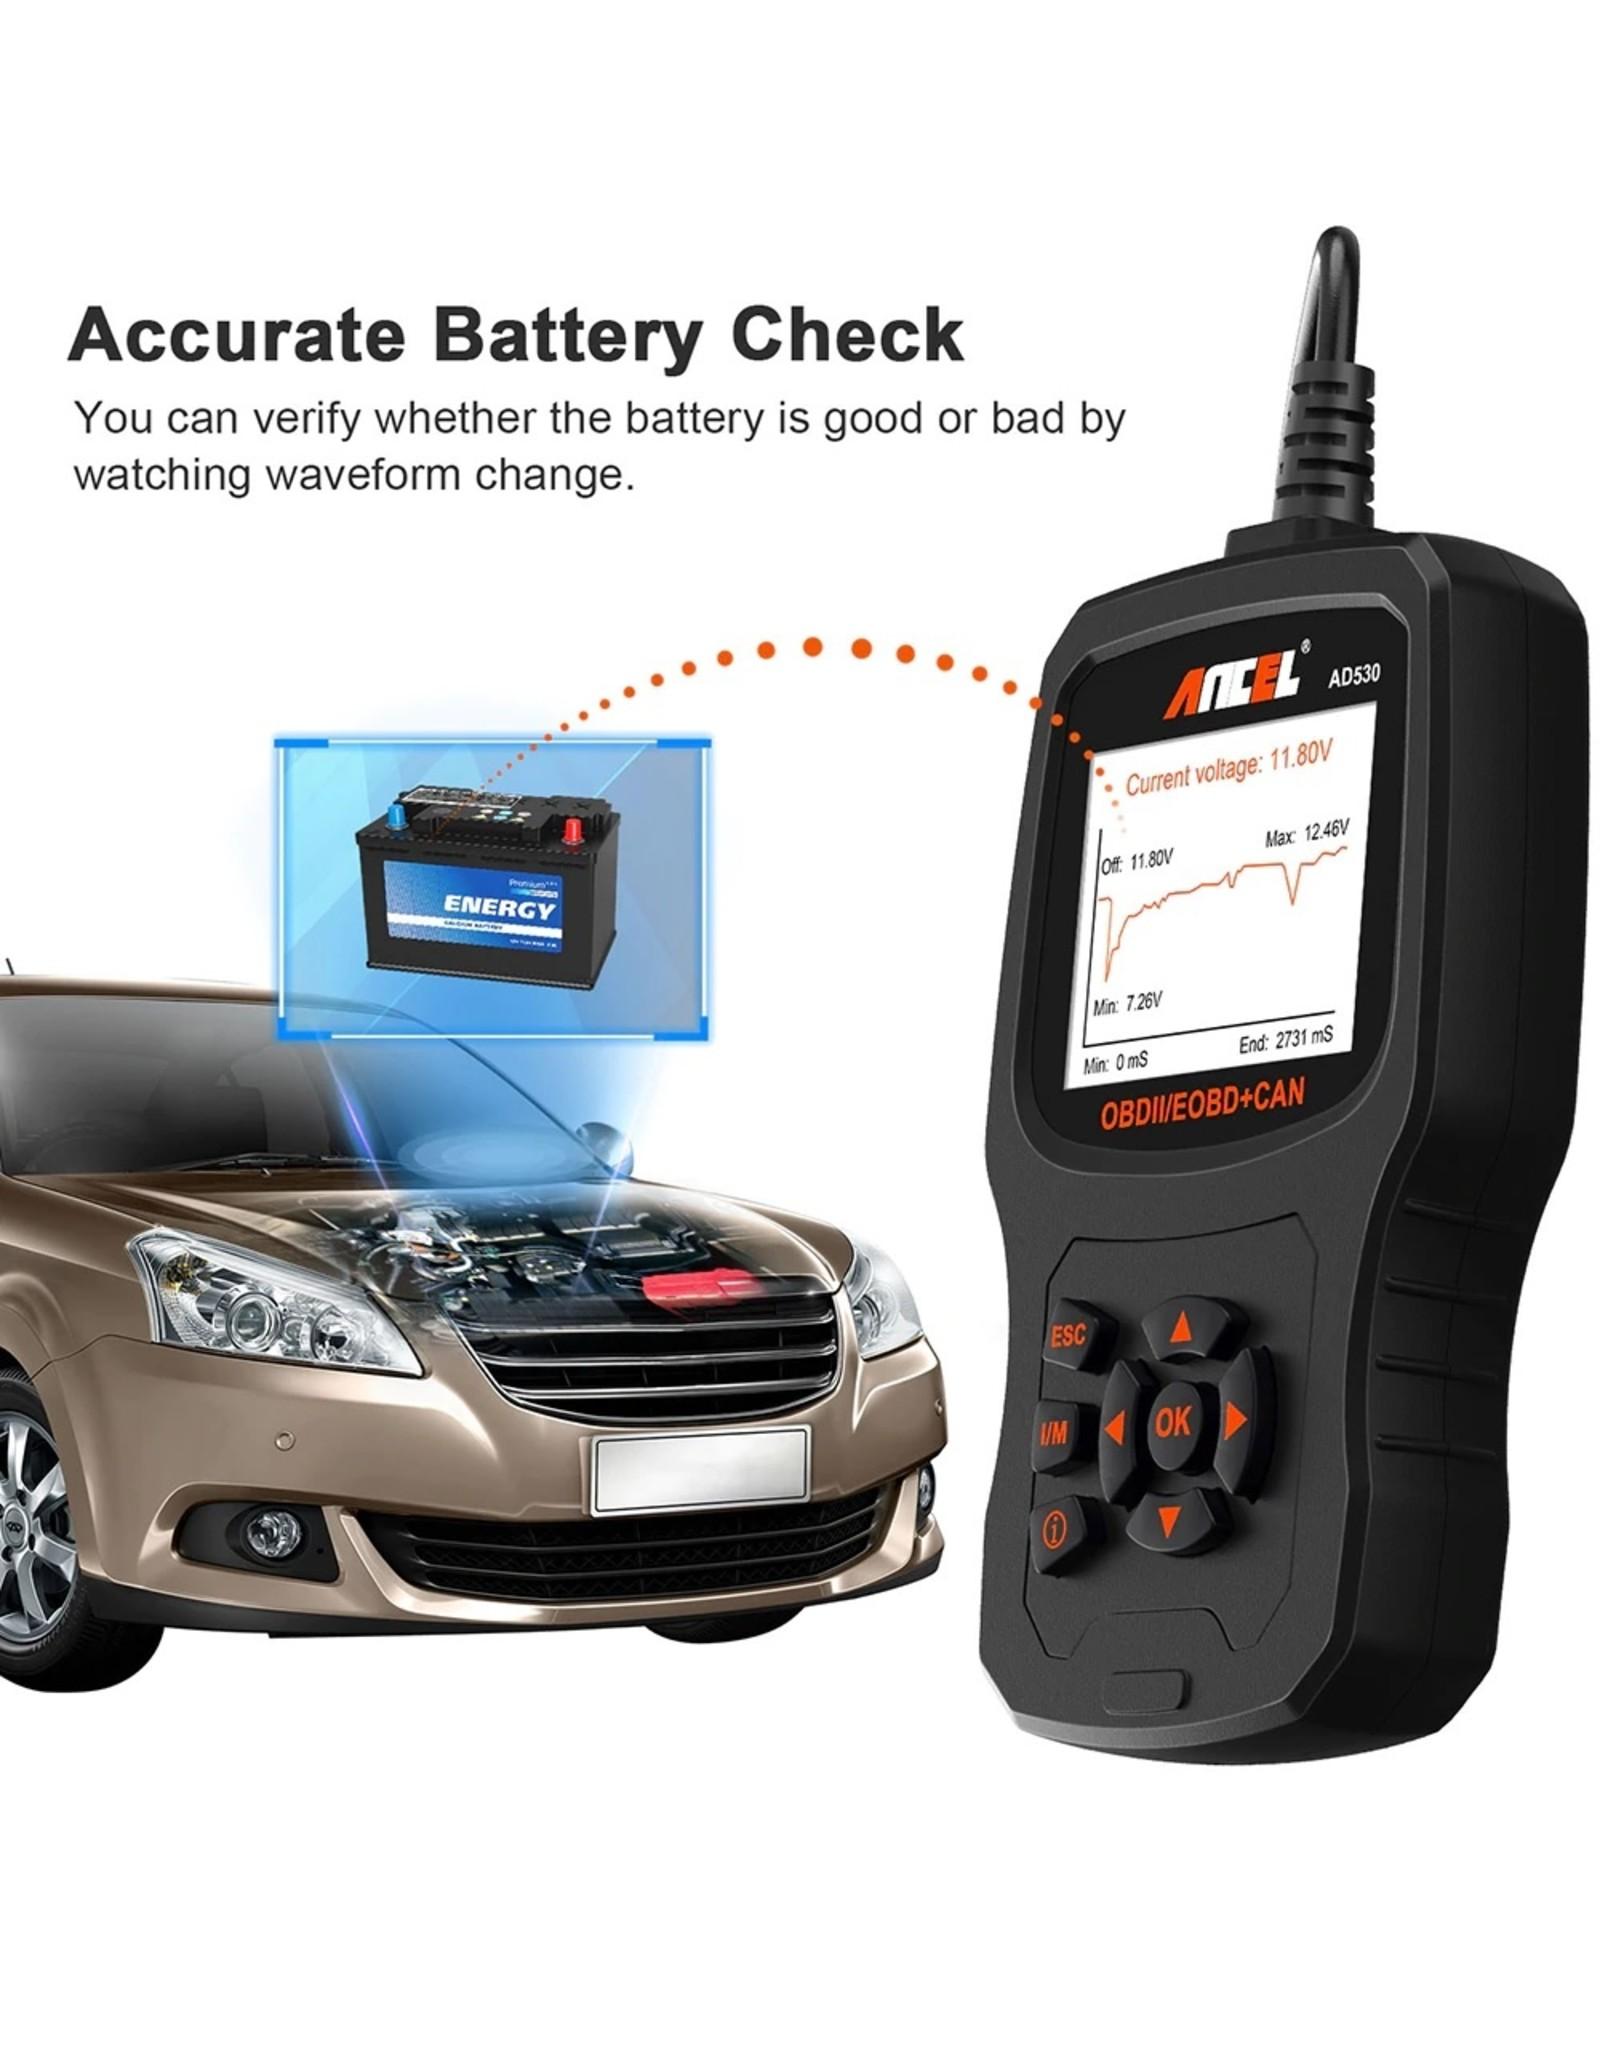 ANCEL AD530 OBD II Auto Code Reader Volledige OBD Modes Voertuigmotor fout Automotive OBD2 Scanner Diagnostische Scan Tool met Batterij Tester Functie